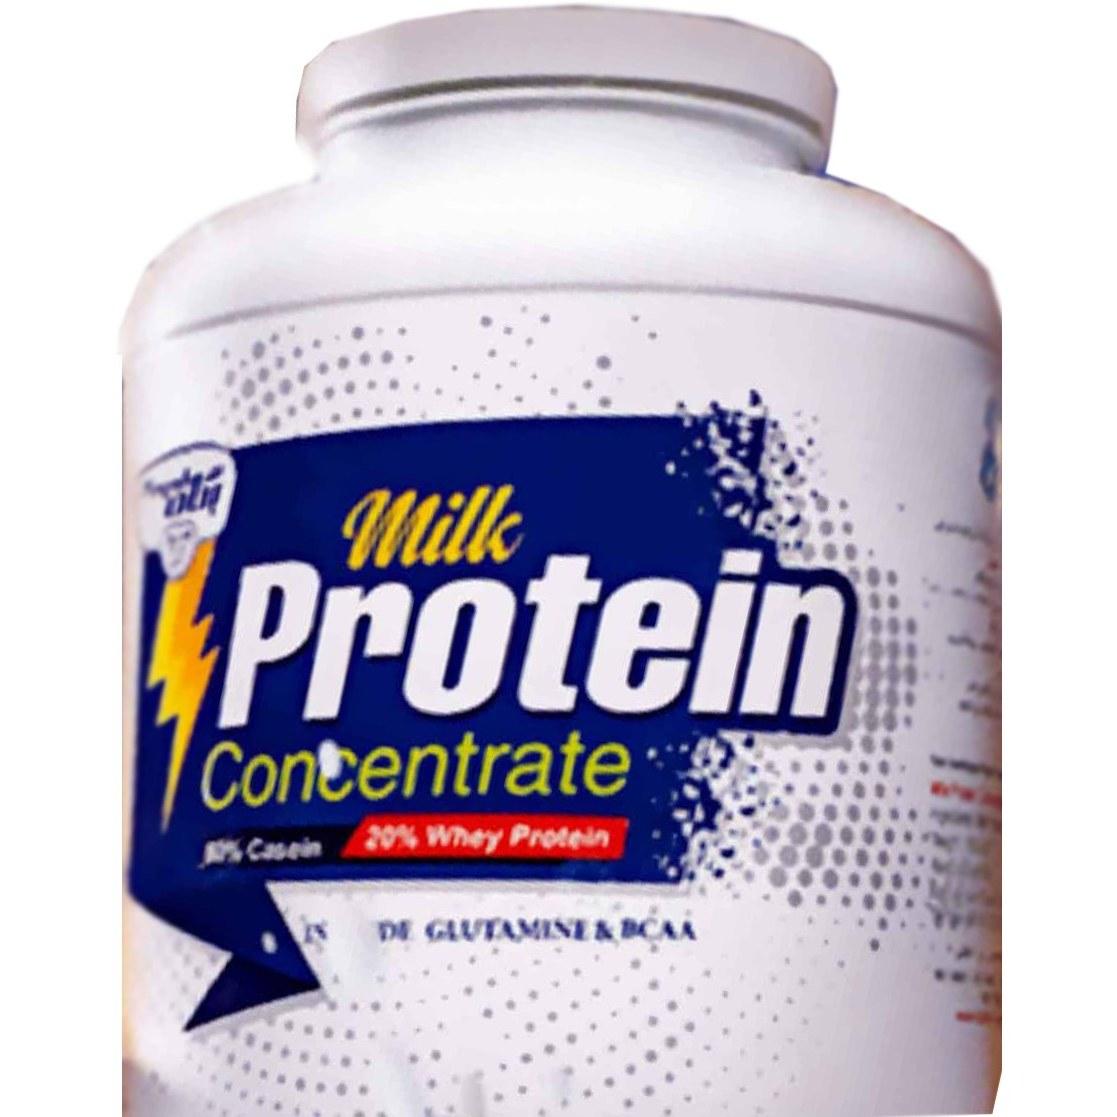 تصویر پودر پروتئین شیر پگاه تبریز